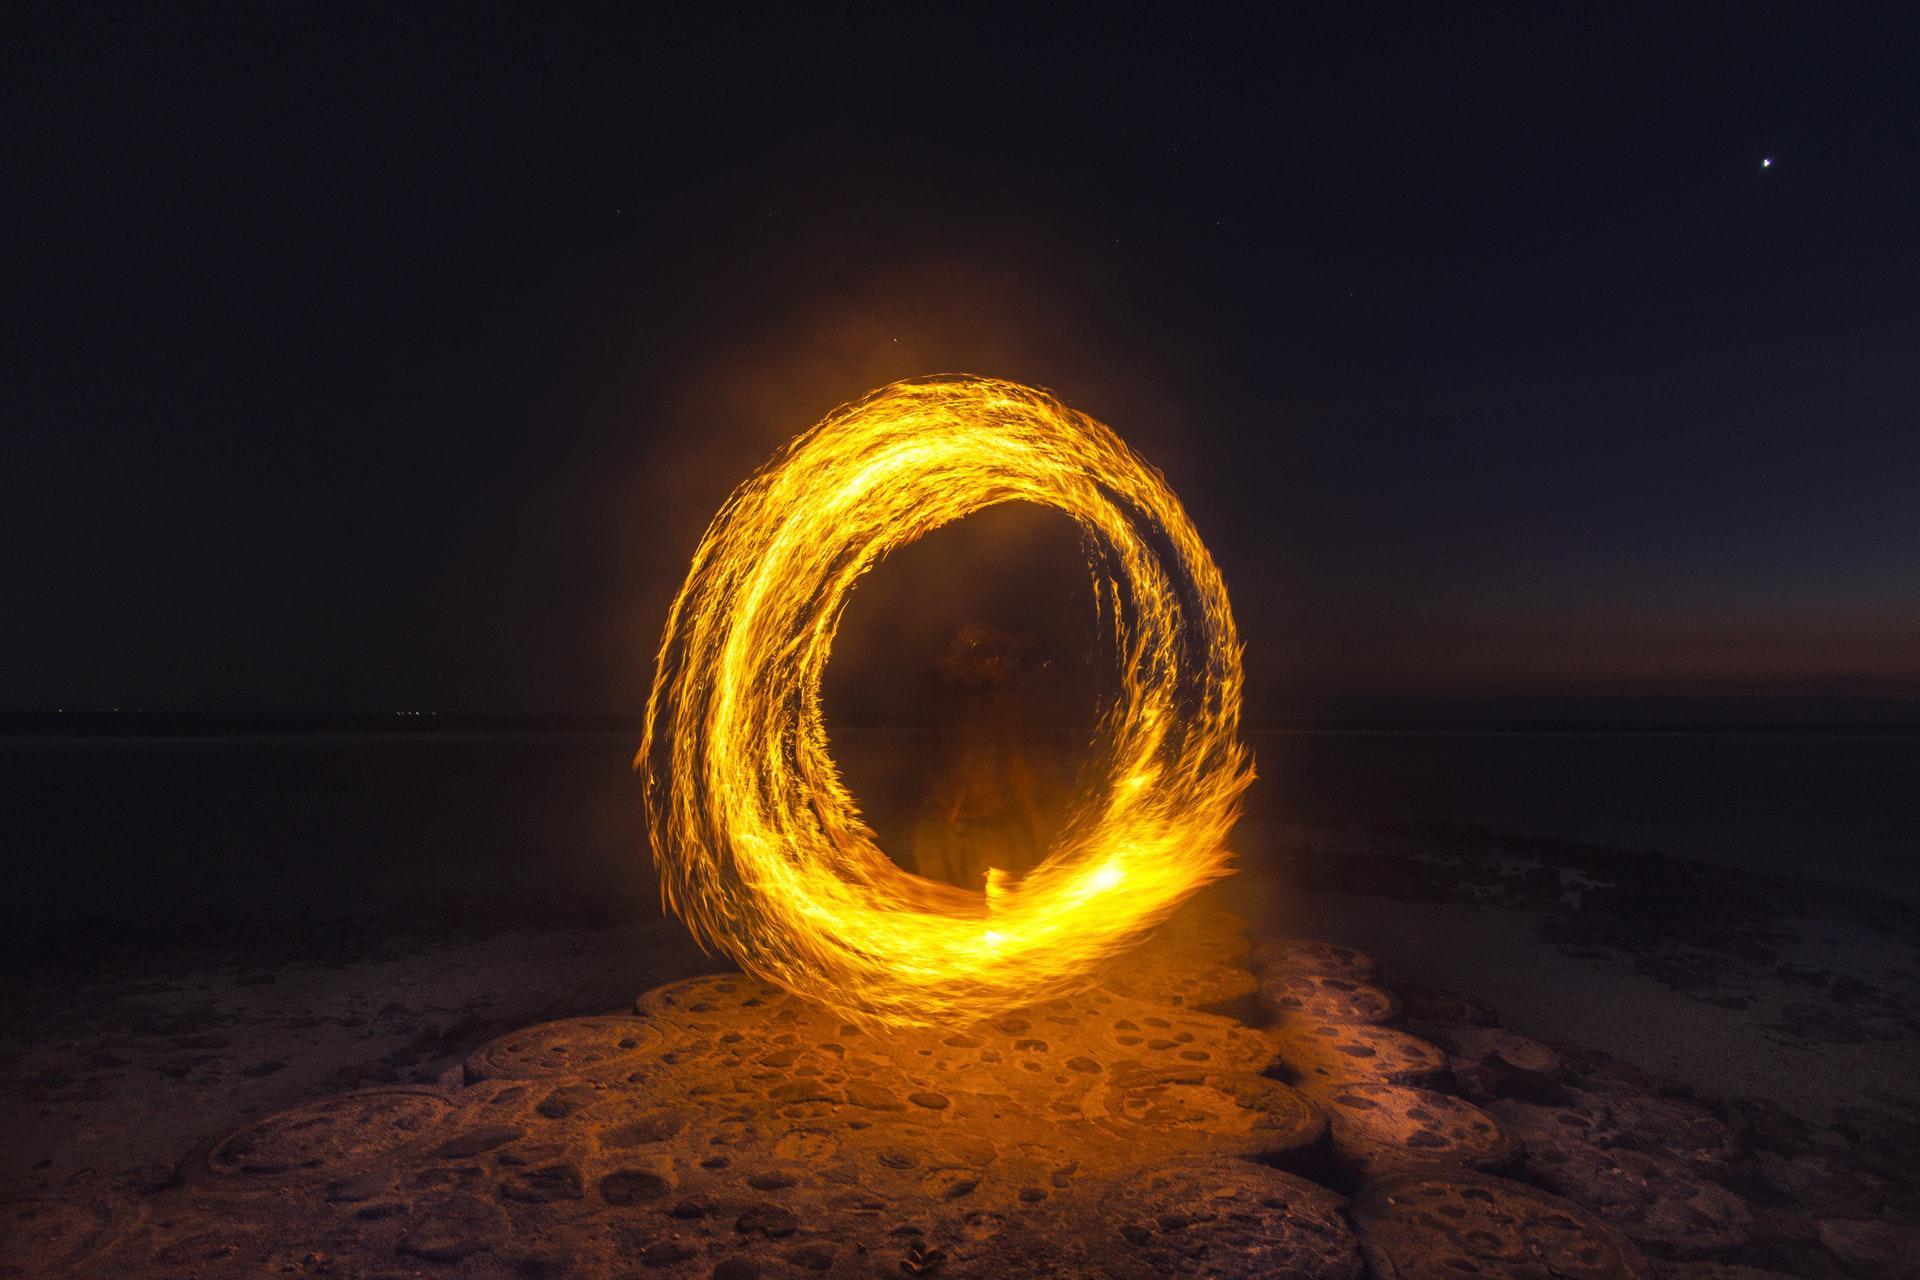 عکس زمینه حلقه آتش در صحرا پس زمینه